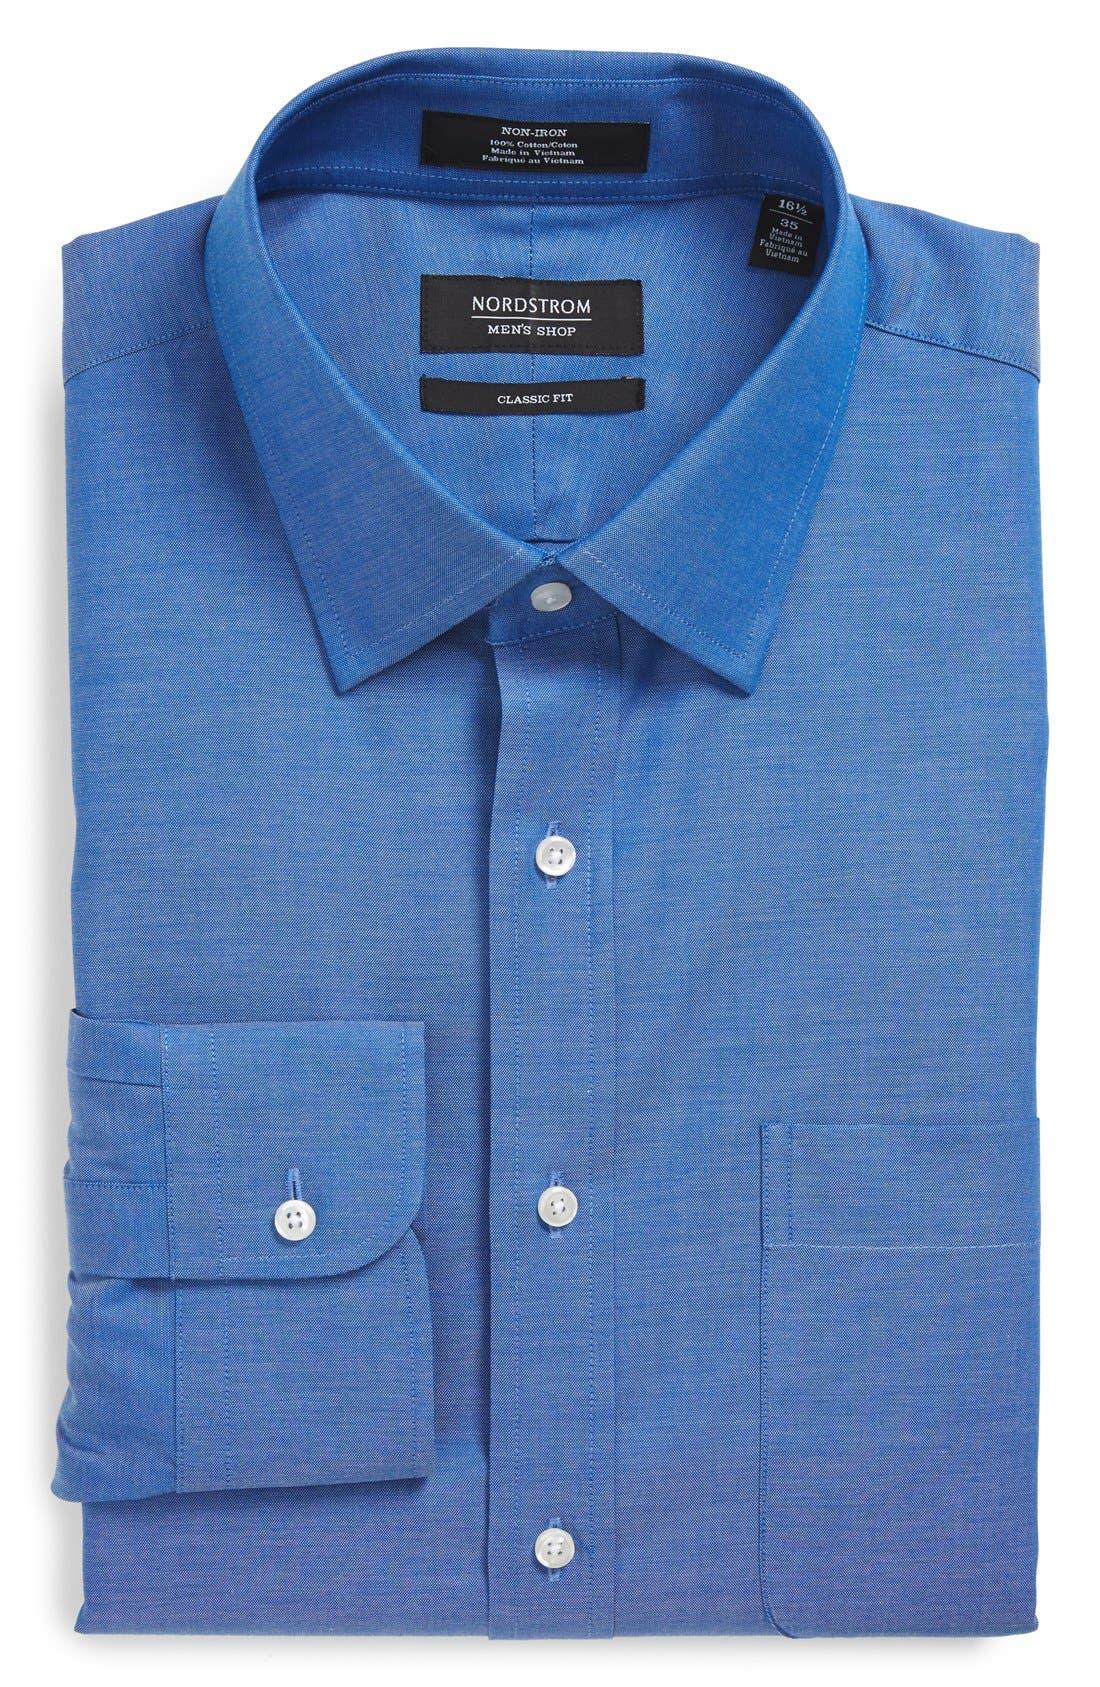 NORDSTROM MENS SHOP Classic Fit Non-Iron Solid Dress Shirt